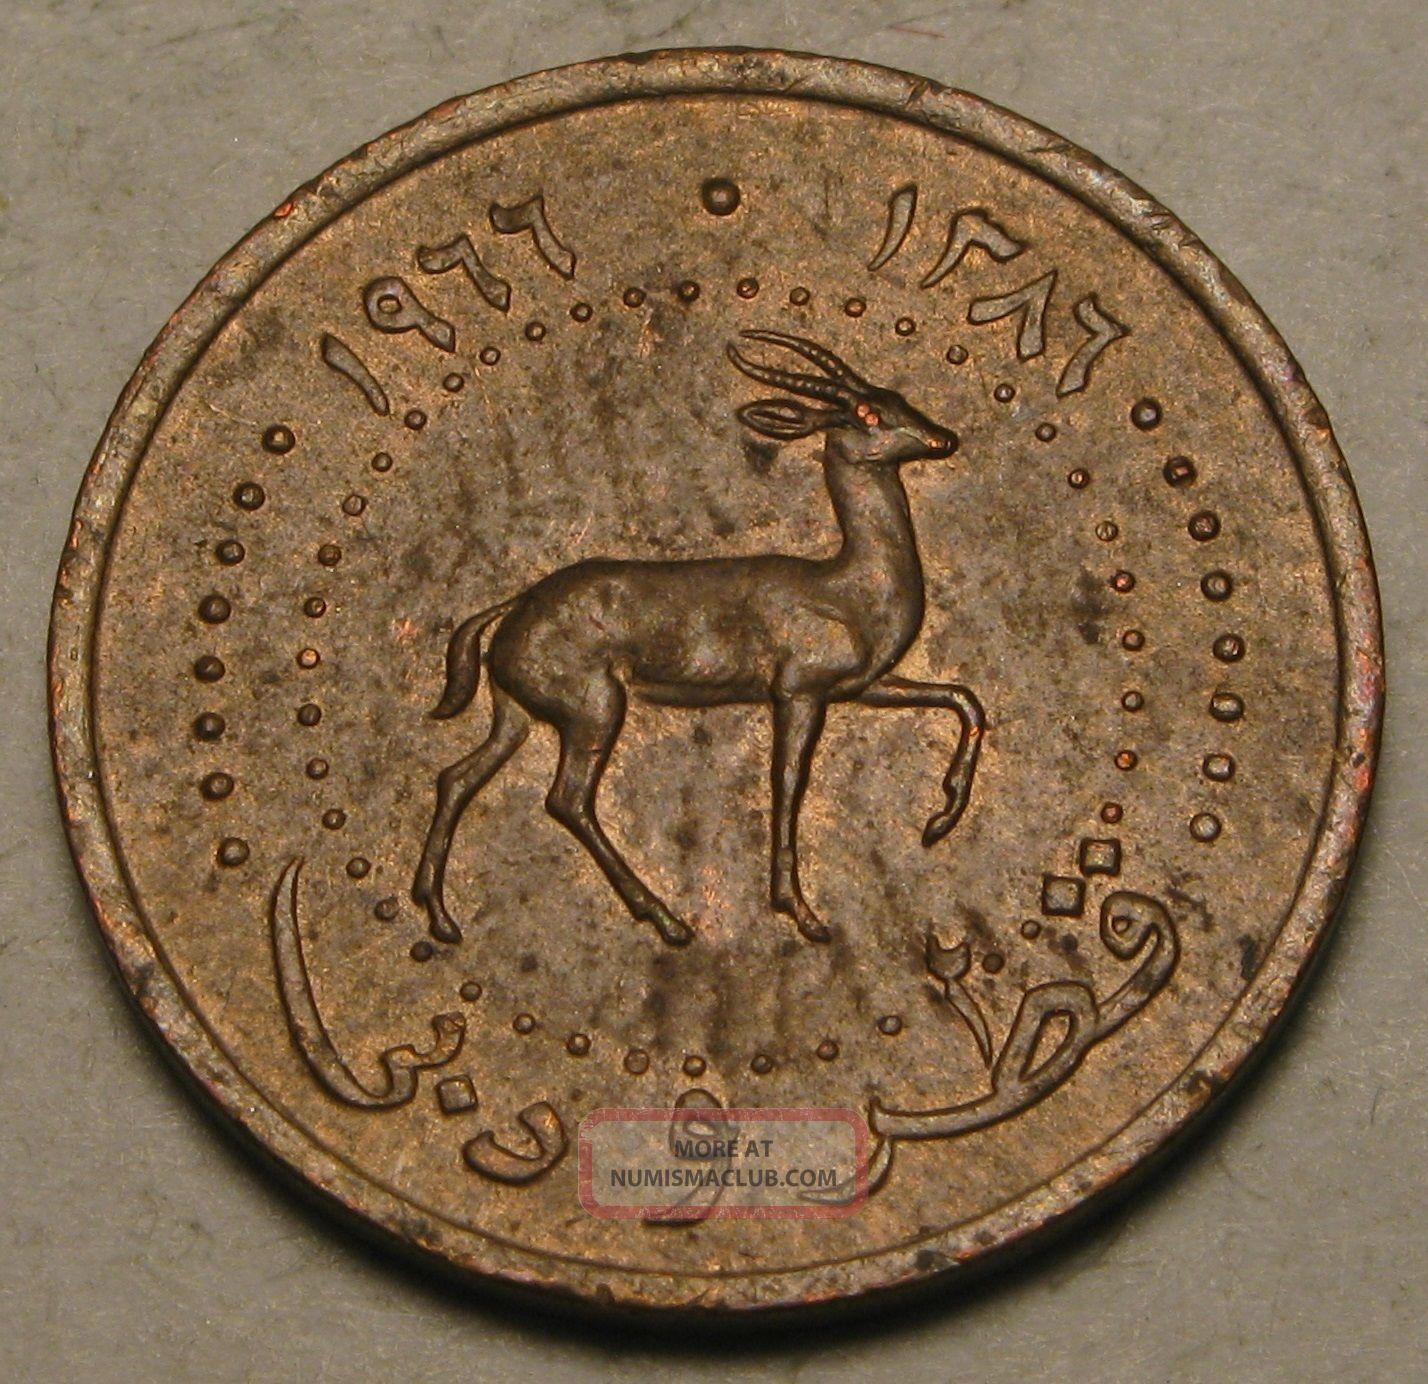 Qatar & Dubai 1 Dirhem Ah 1386 / Ad 1966 - Bronze - Ahmad Ii.  - Xf/aunc 826 Middle East photo